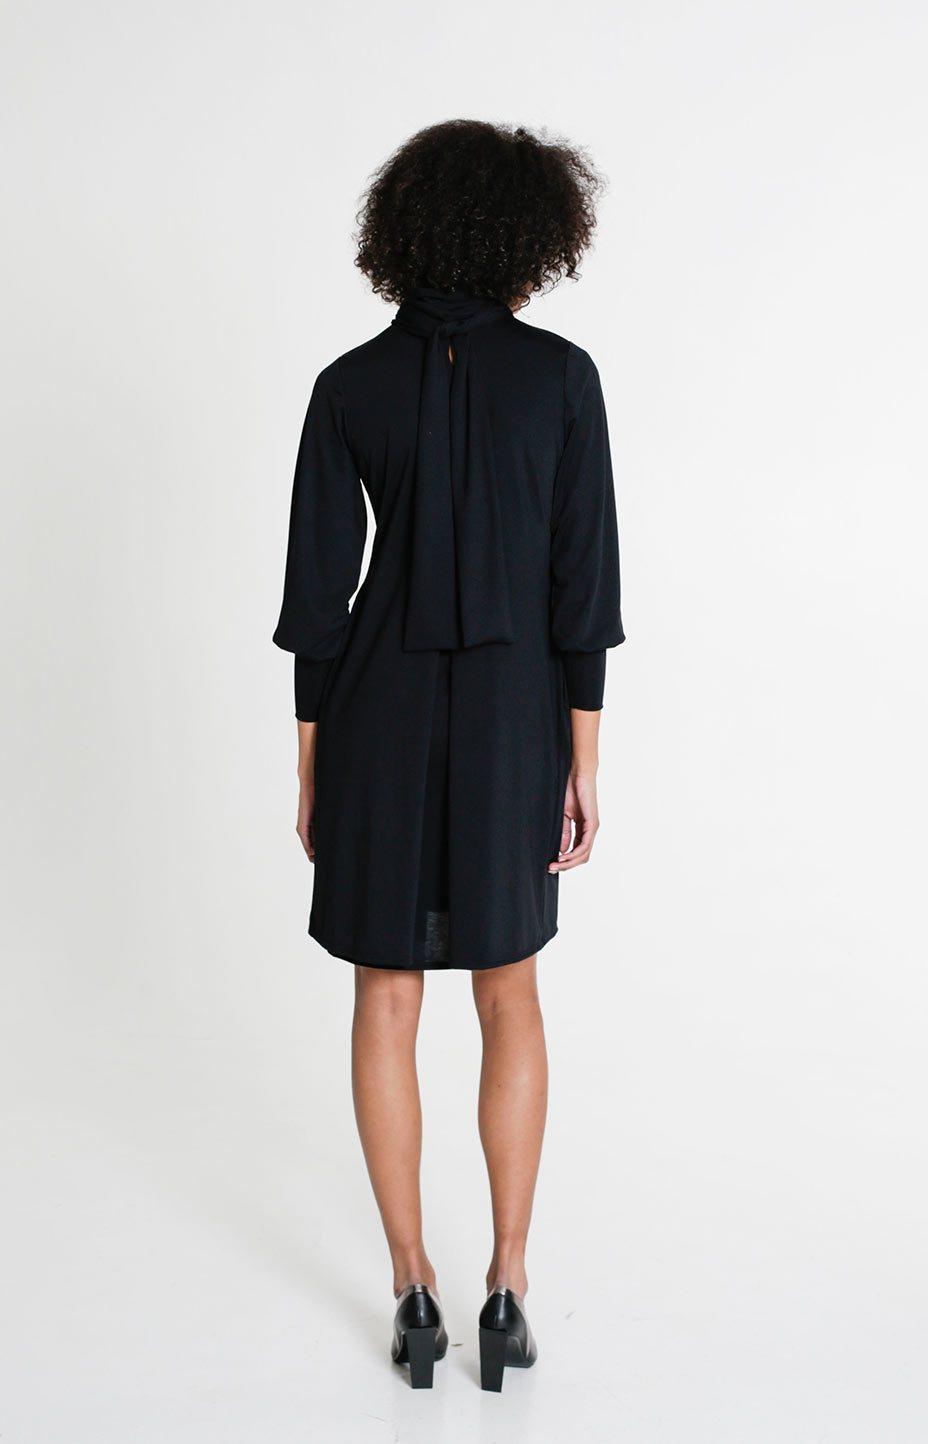 Knot dress black